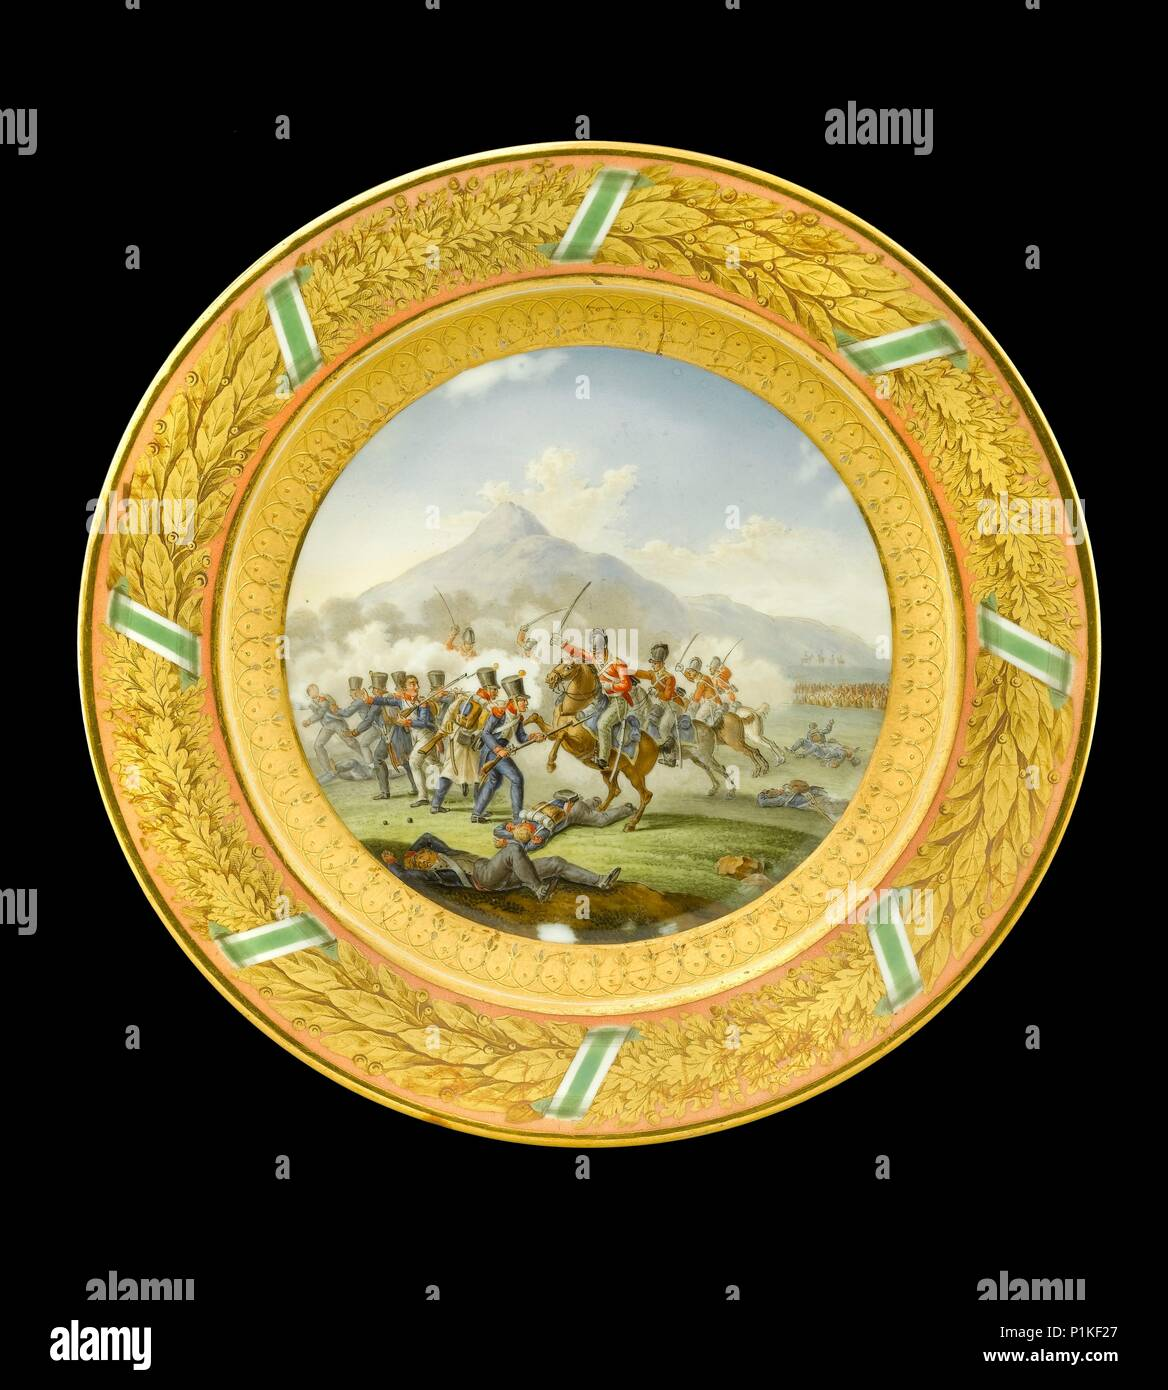 Dessert plate depicting the Battle of Talavera, Spain, 1809 (1818). Item in Apsley House, London. Dessert plate from the Duke of Wellington's Saxon Se - Stock Image